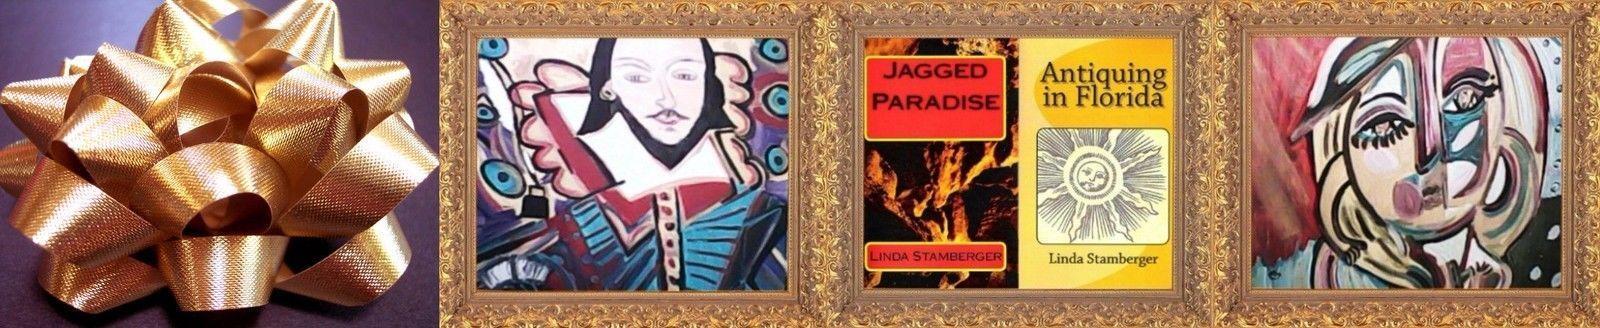 Stamberger Art and True Vintage!